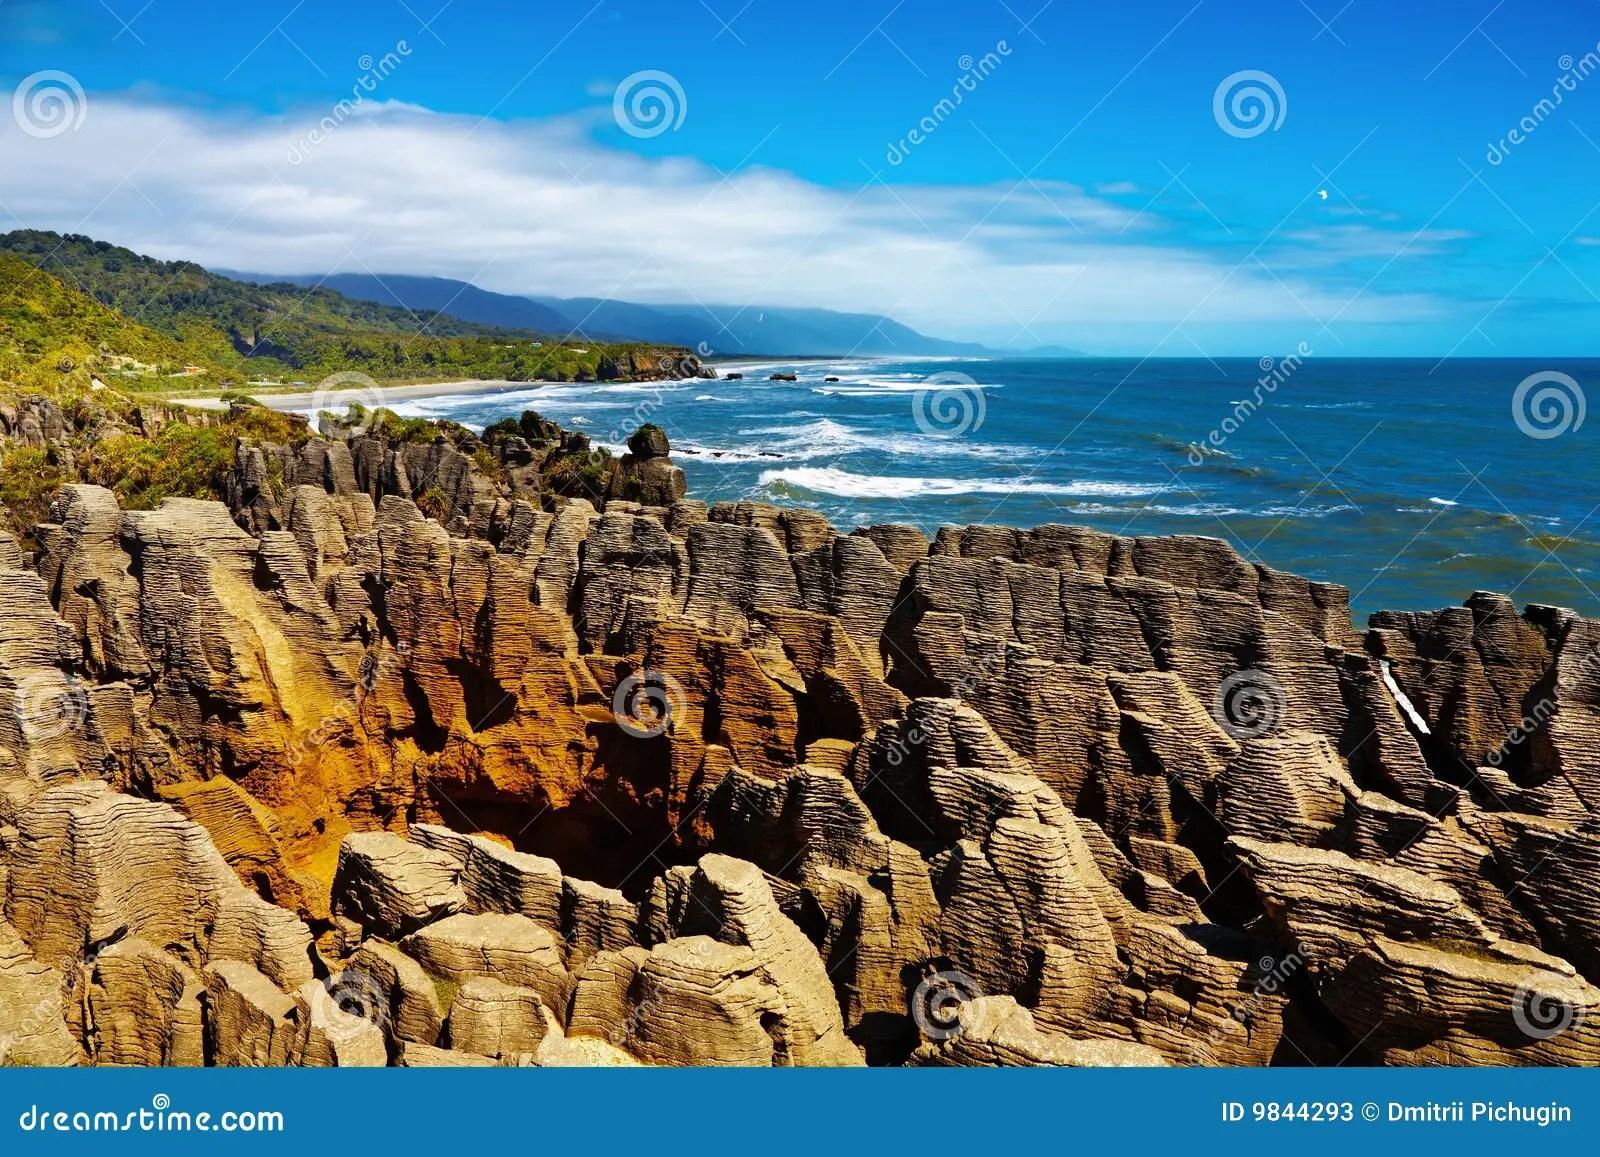 Landscape Stone River Rock